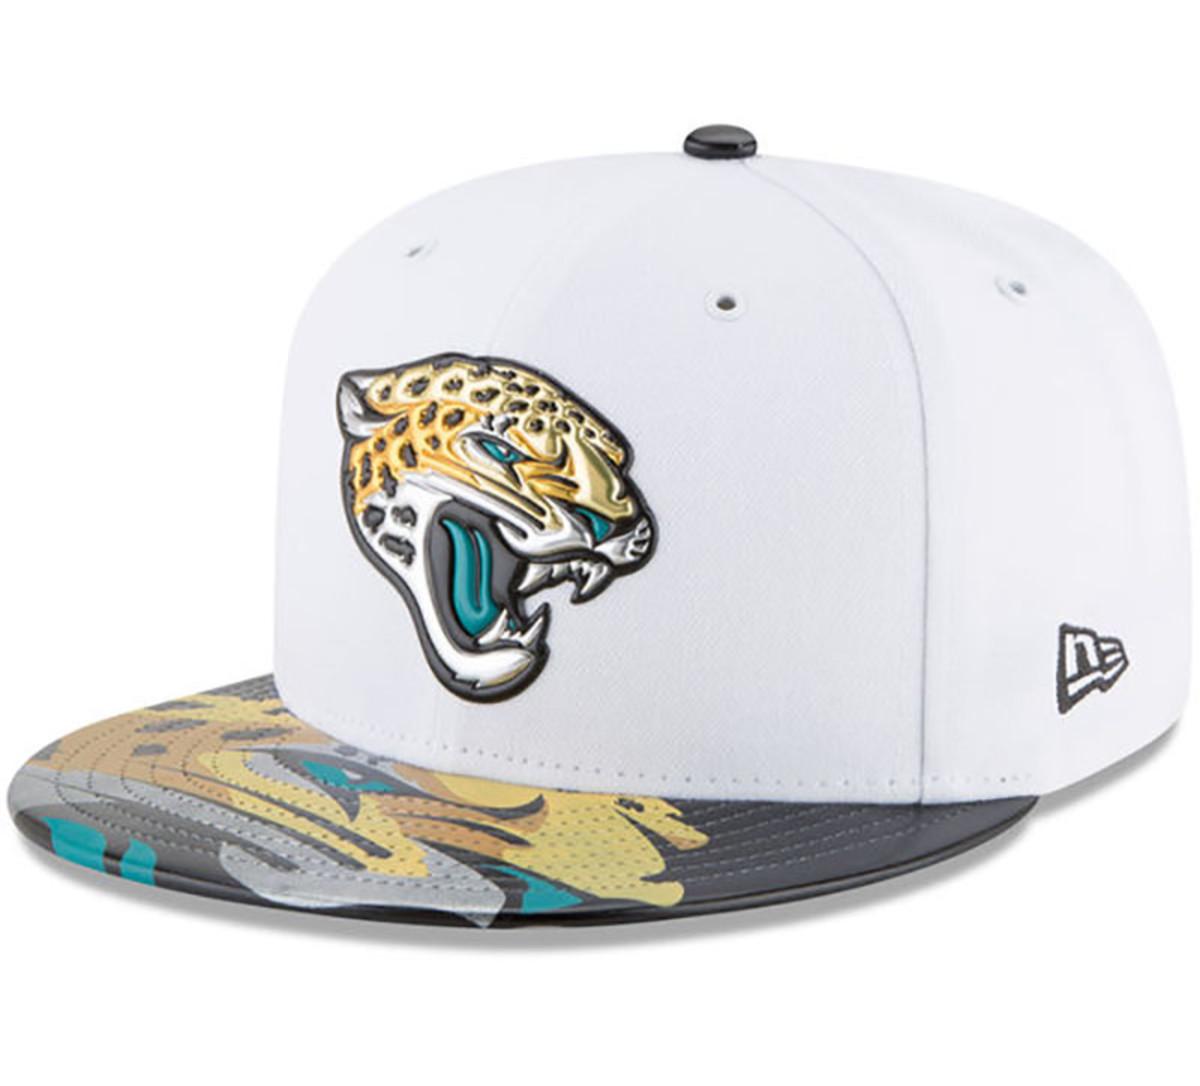 jaguars-draft-hat-ranking.jpeg